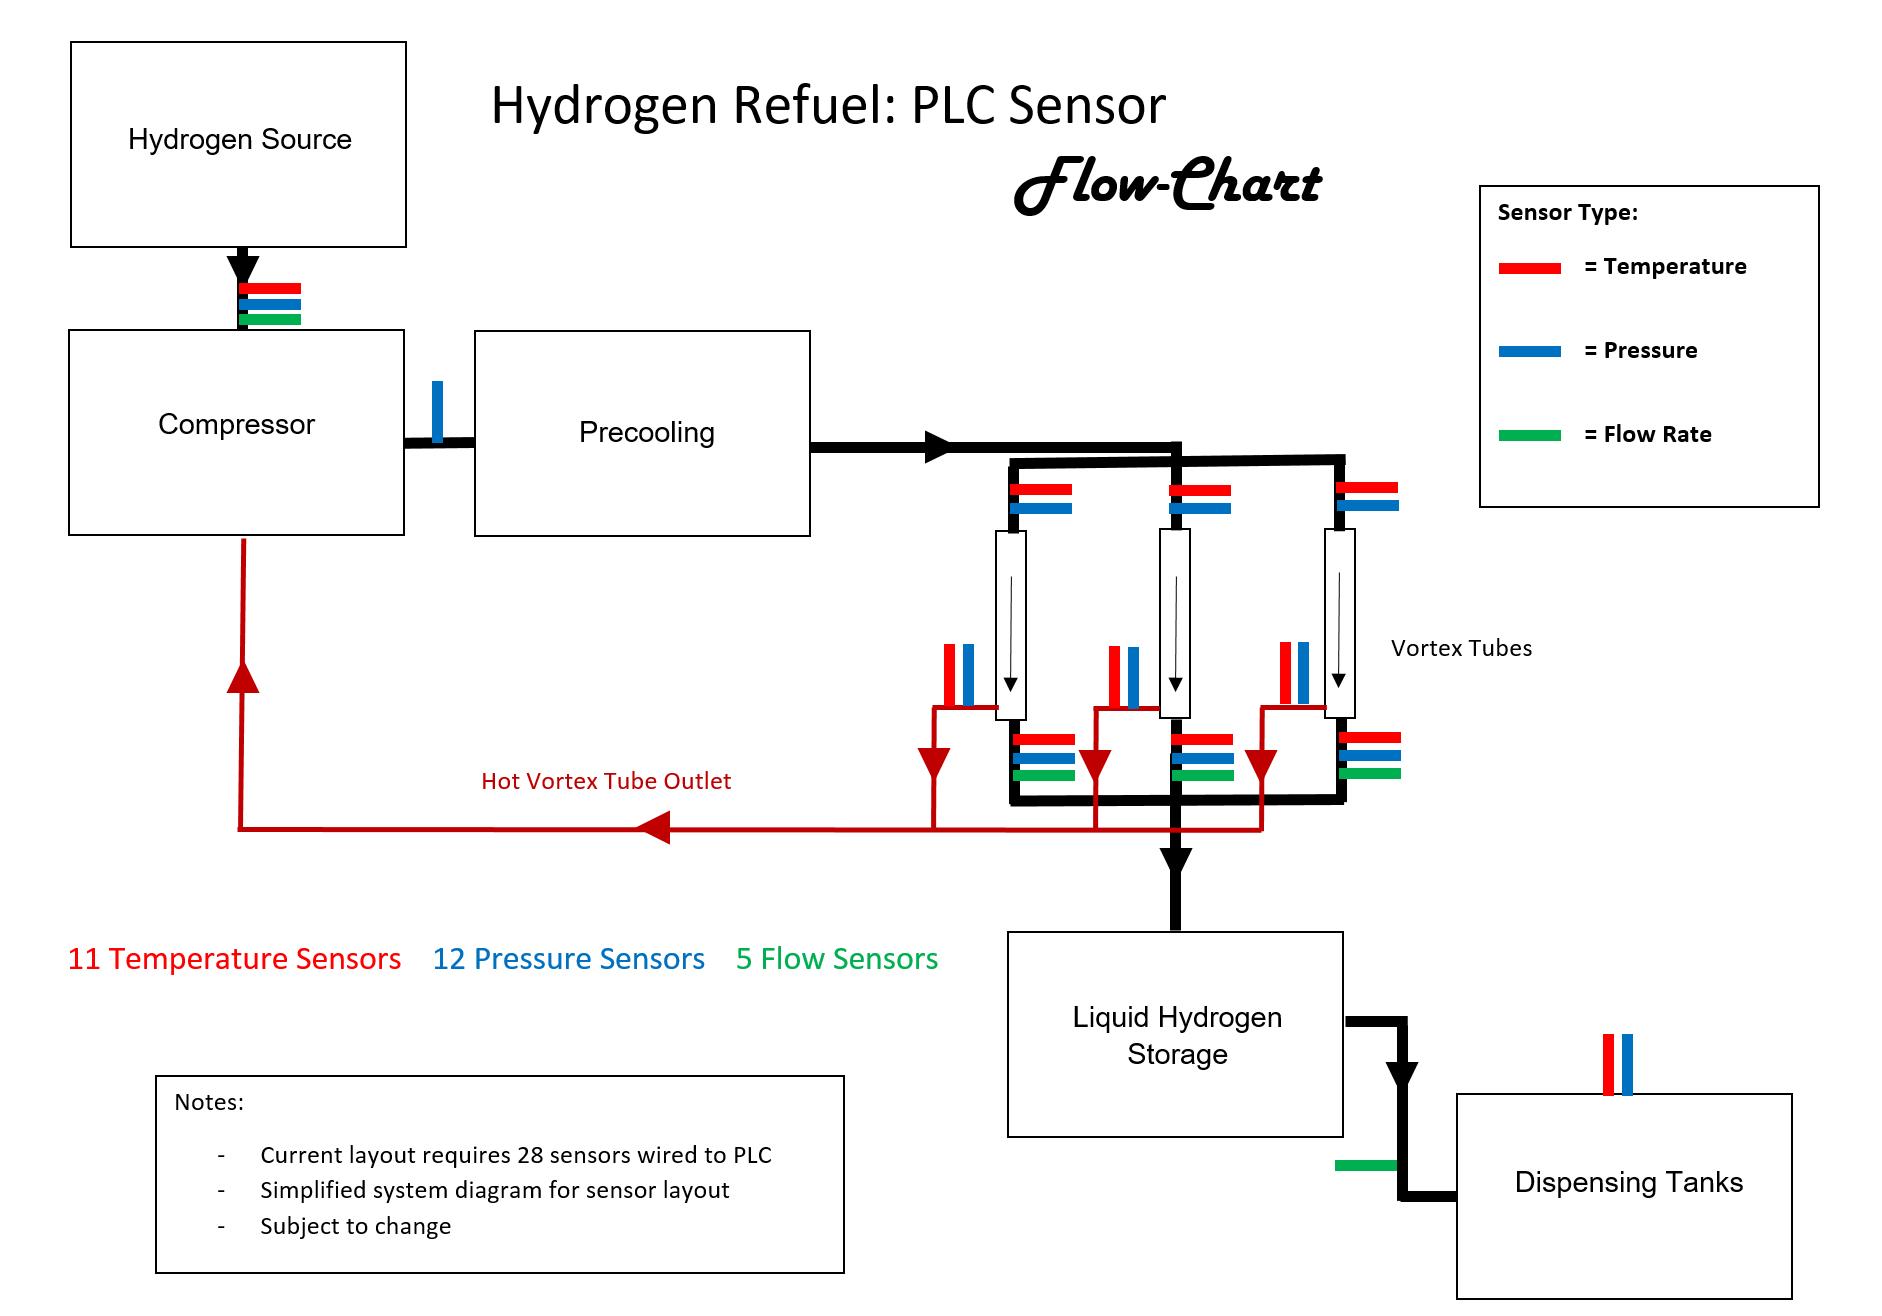 Flow chart logic seostrit youtube flow chart logic pooptronica Choice Image